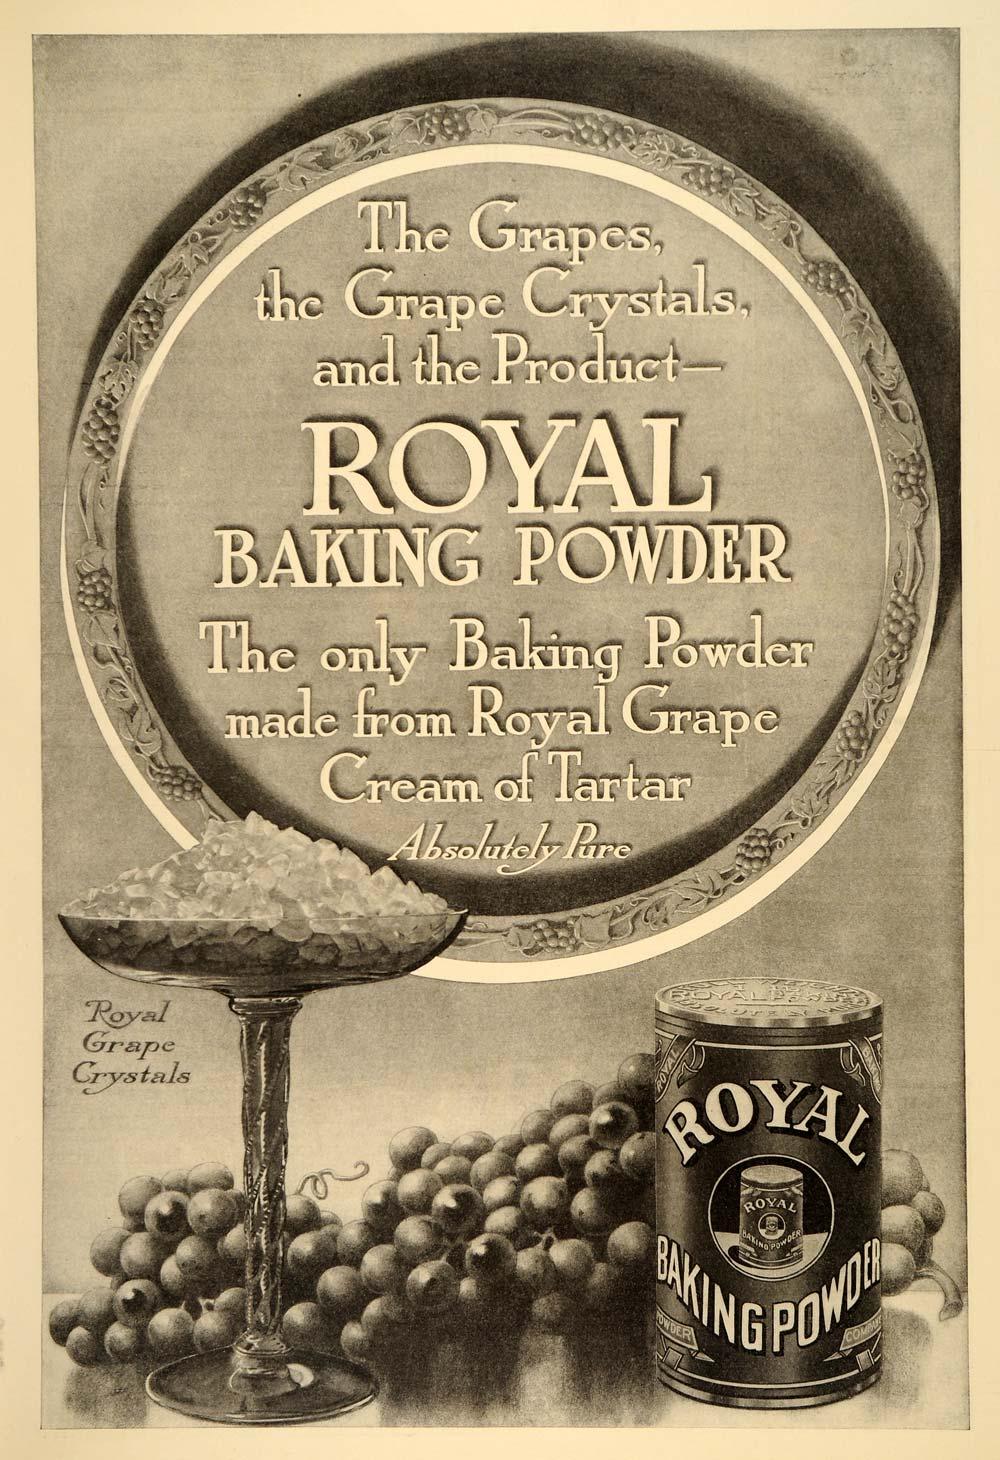 1914 Royal Baking Powder Advertisement Collectibles